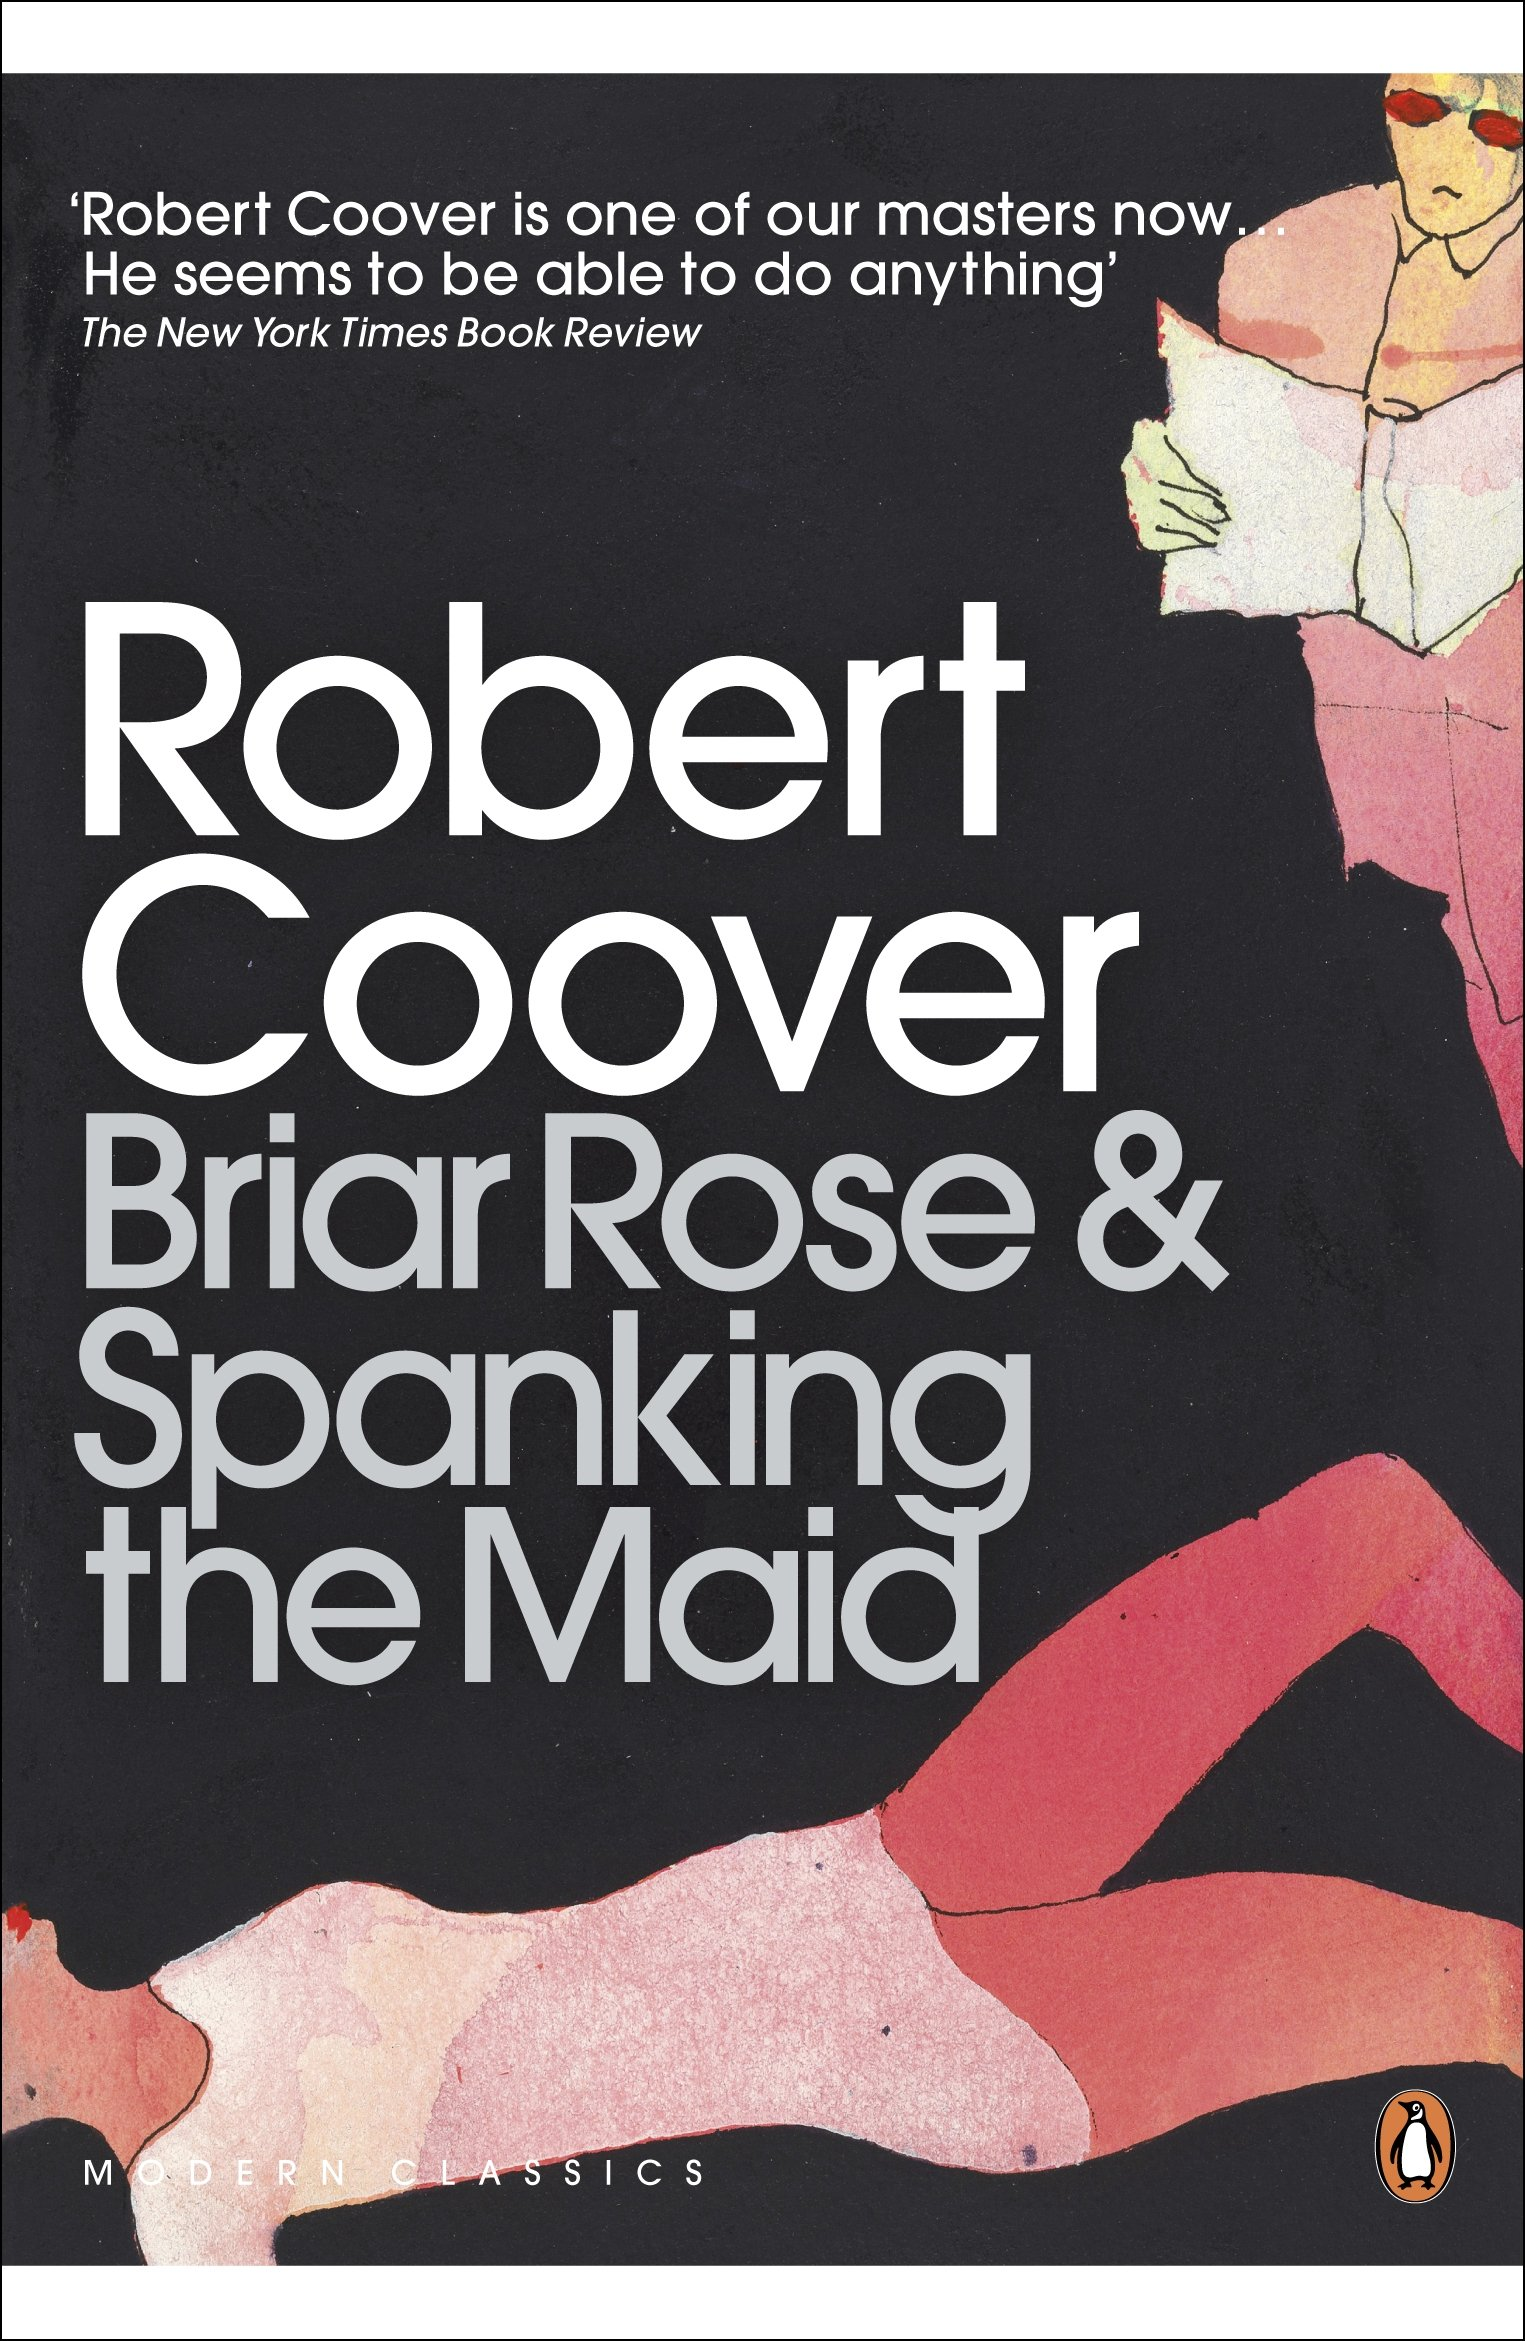 Briar Rose & Spanking the Maid (Penguin Modern Classics)